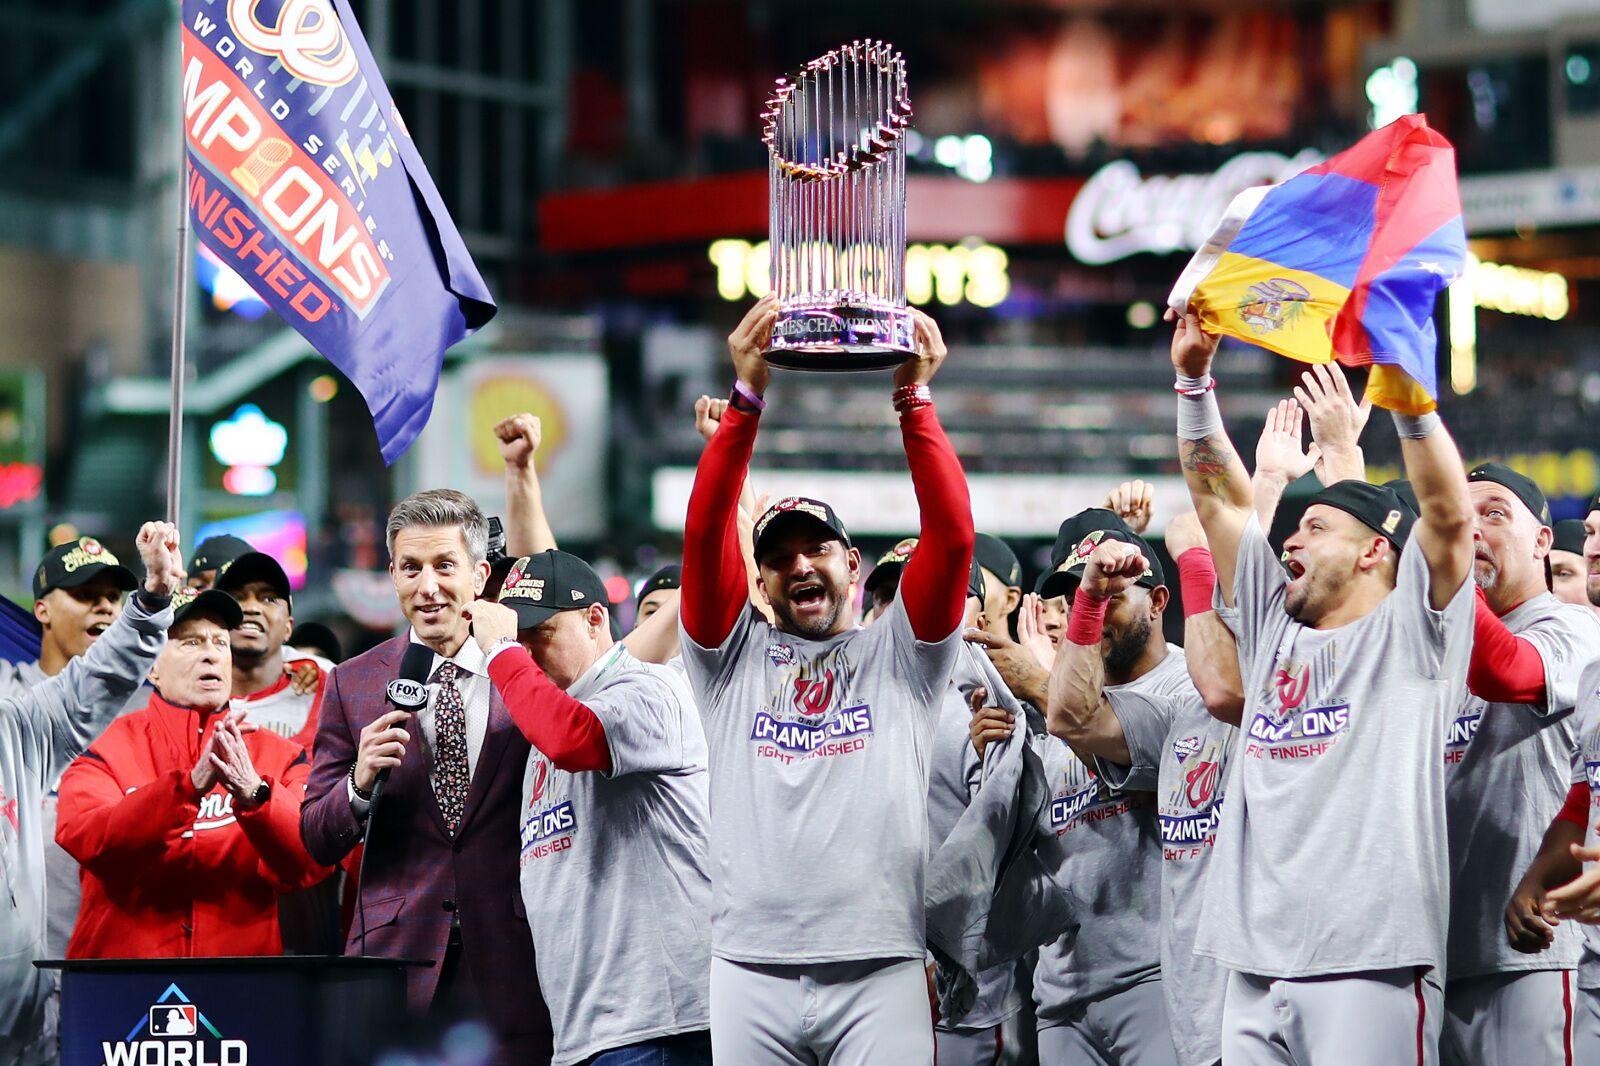 Washington Nationals championship should give hope to many